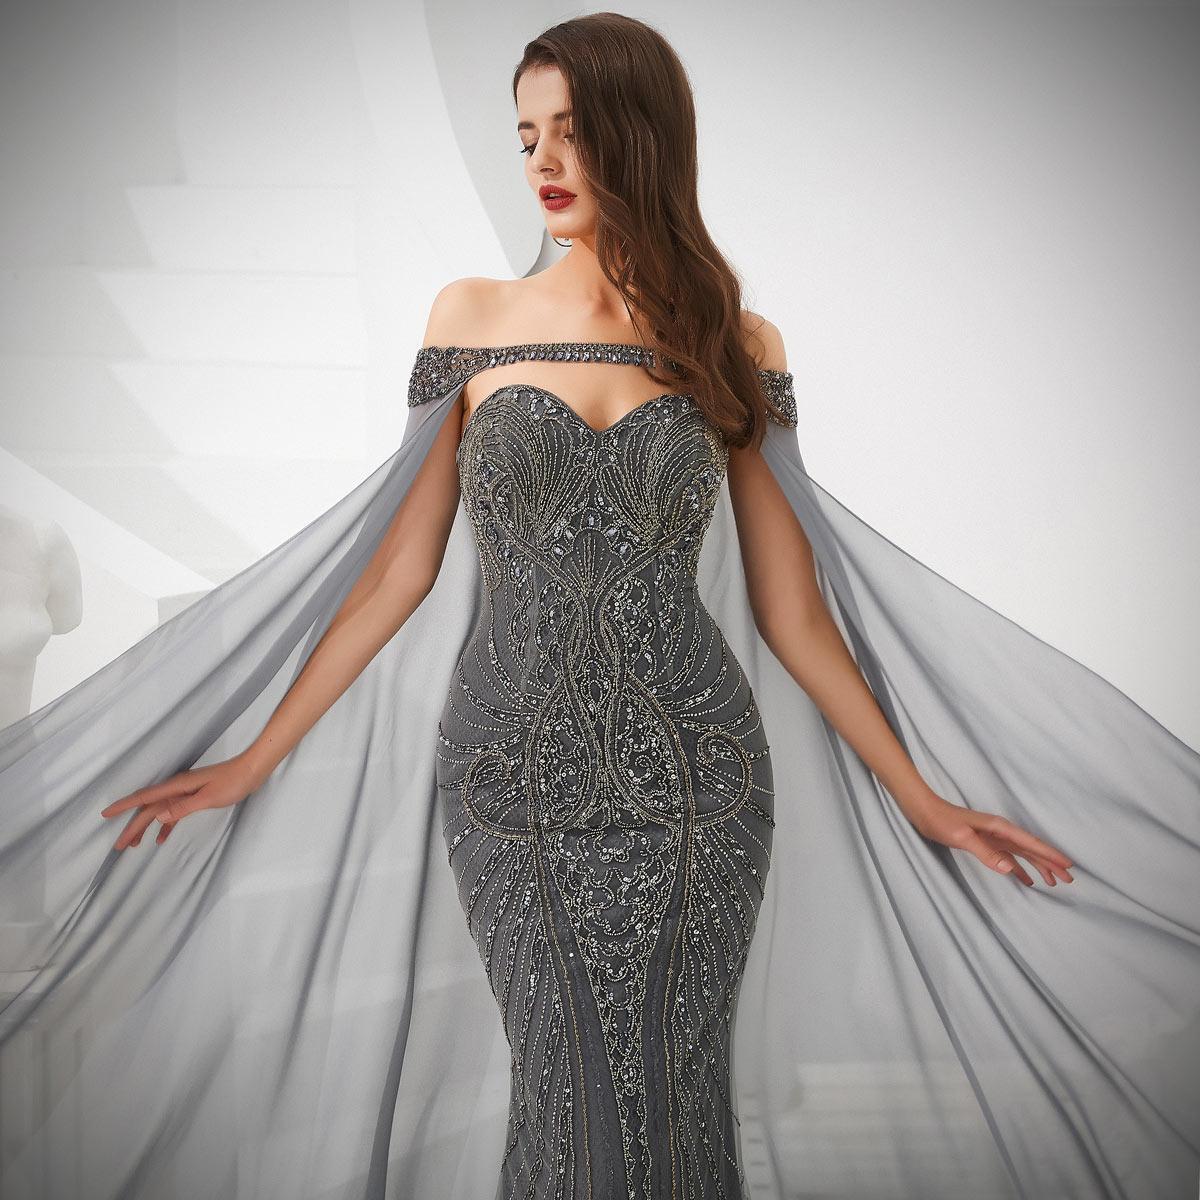 robe habillée longue gris foncé brodée de bijoux